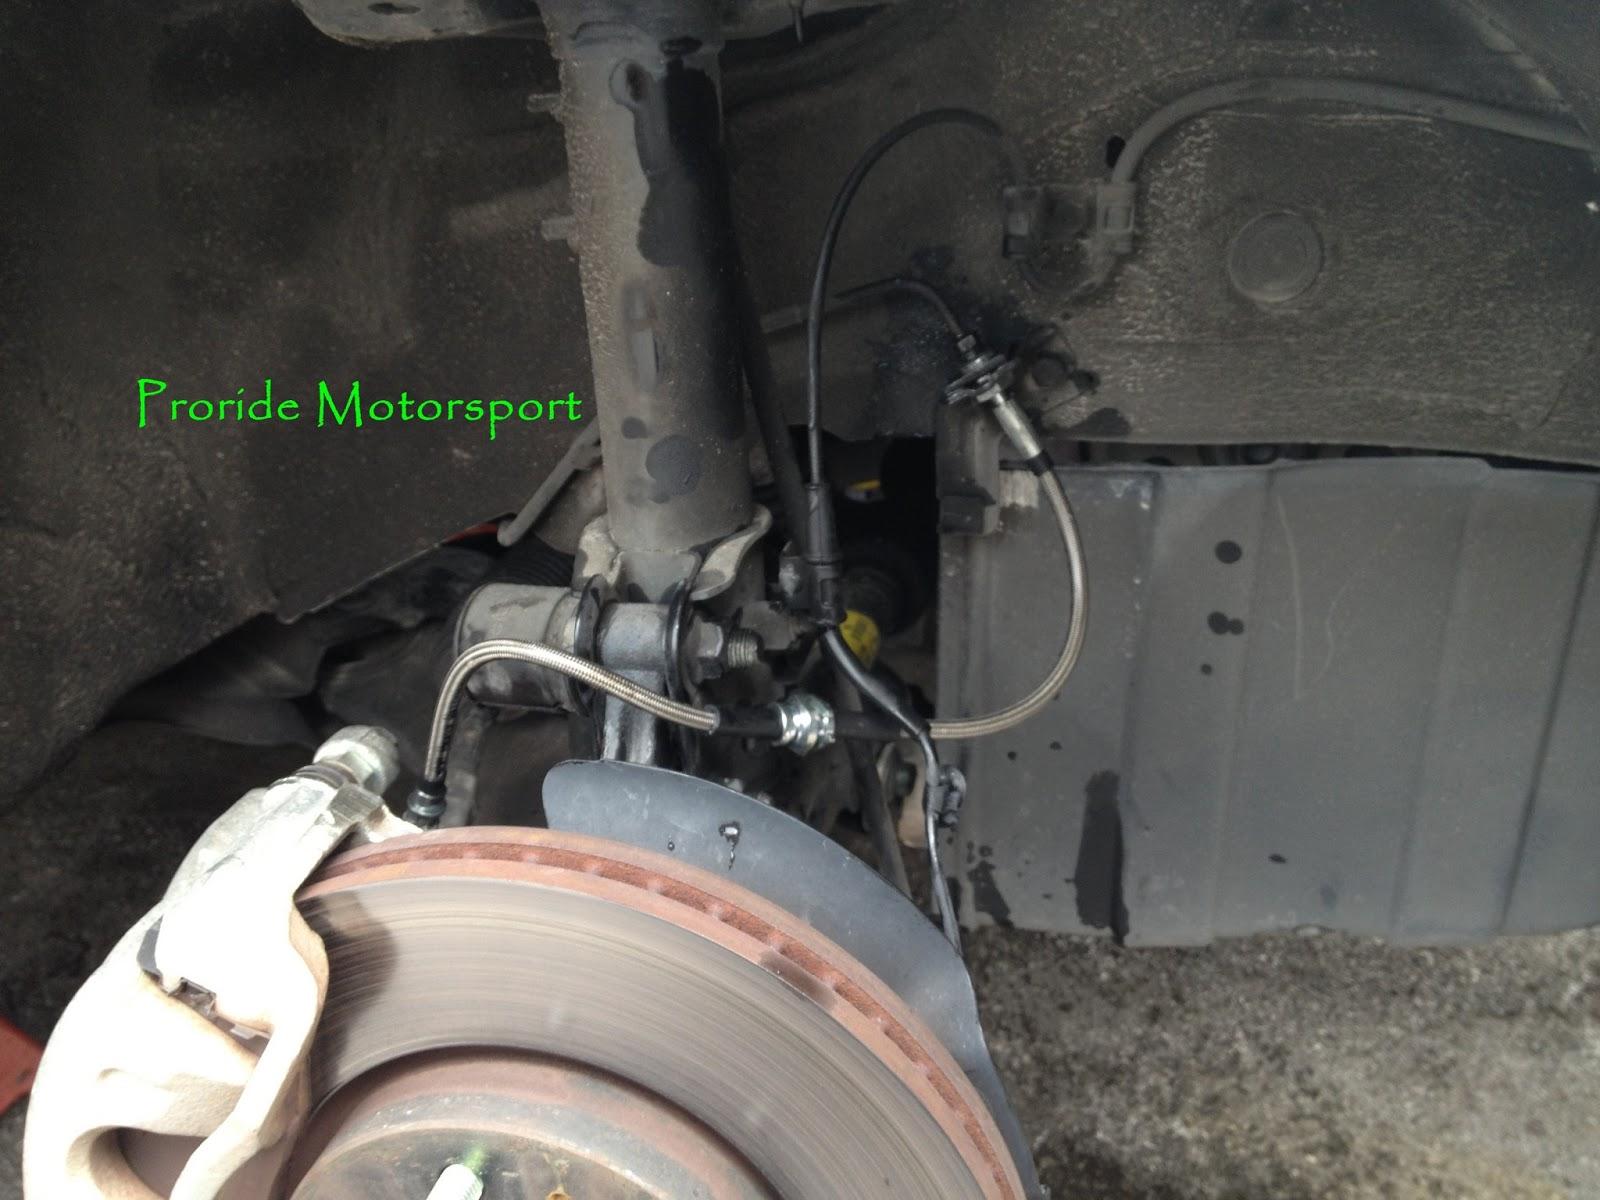 Pro Ride Motorsports Pro Rs Safebrake Steel Braided Brake